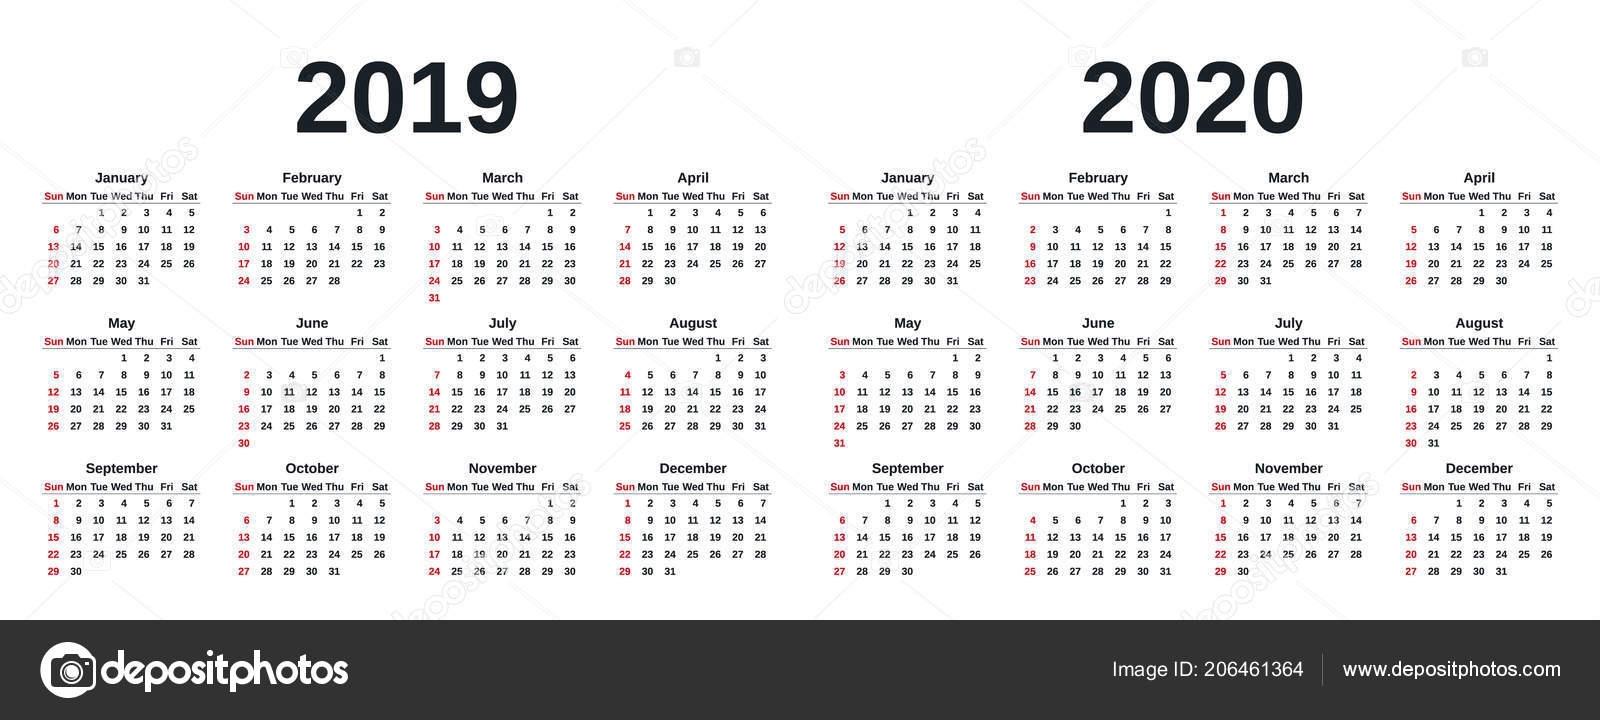 2019 2020 Calendar Vector Graphics Week Starts Sunday Design in 2020 Calendar Monday To Sunday